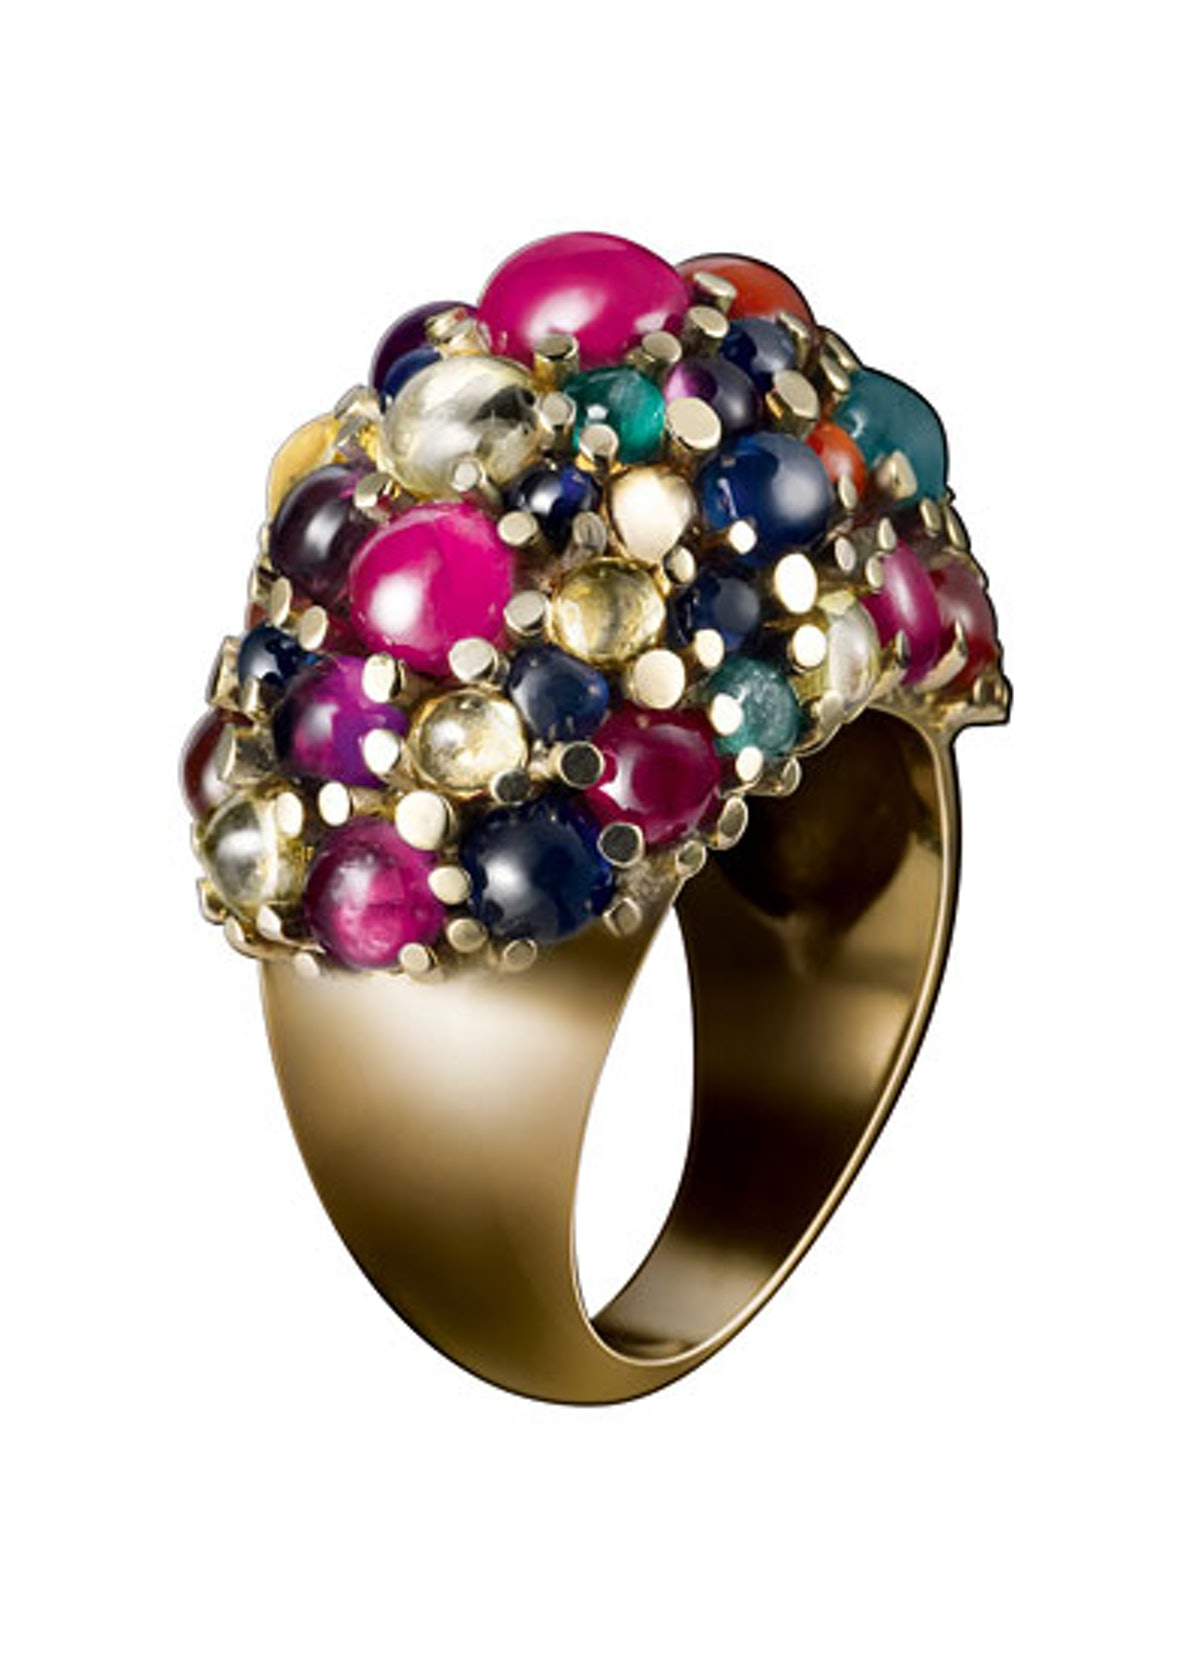 acss-colorful-gems-03-v.jpg